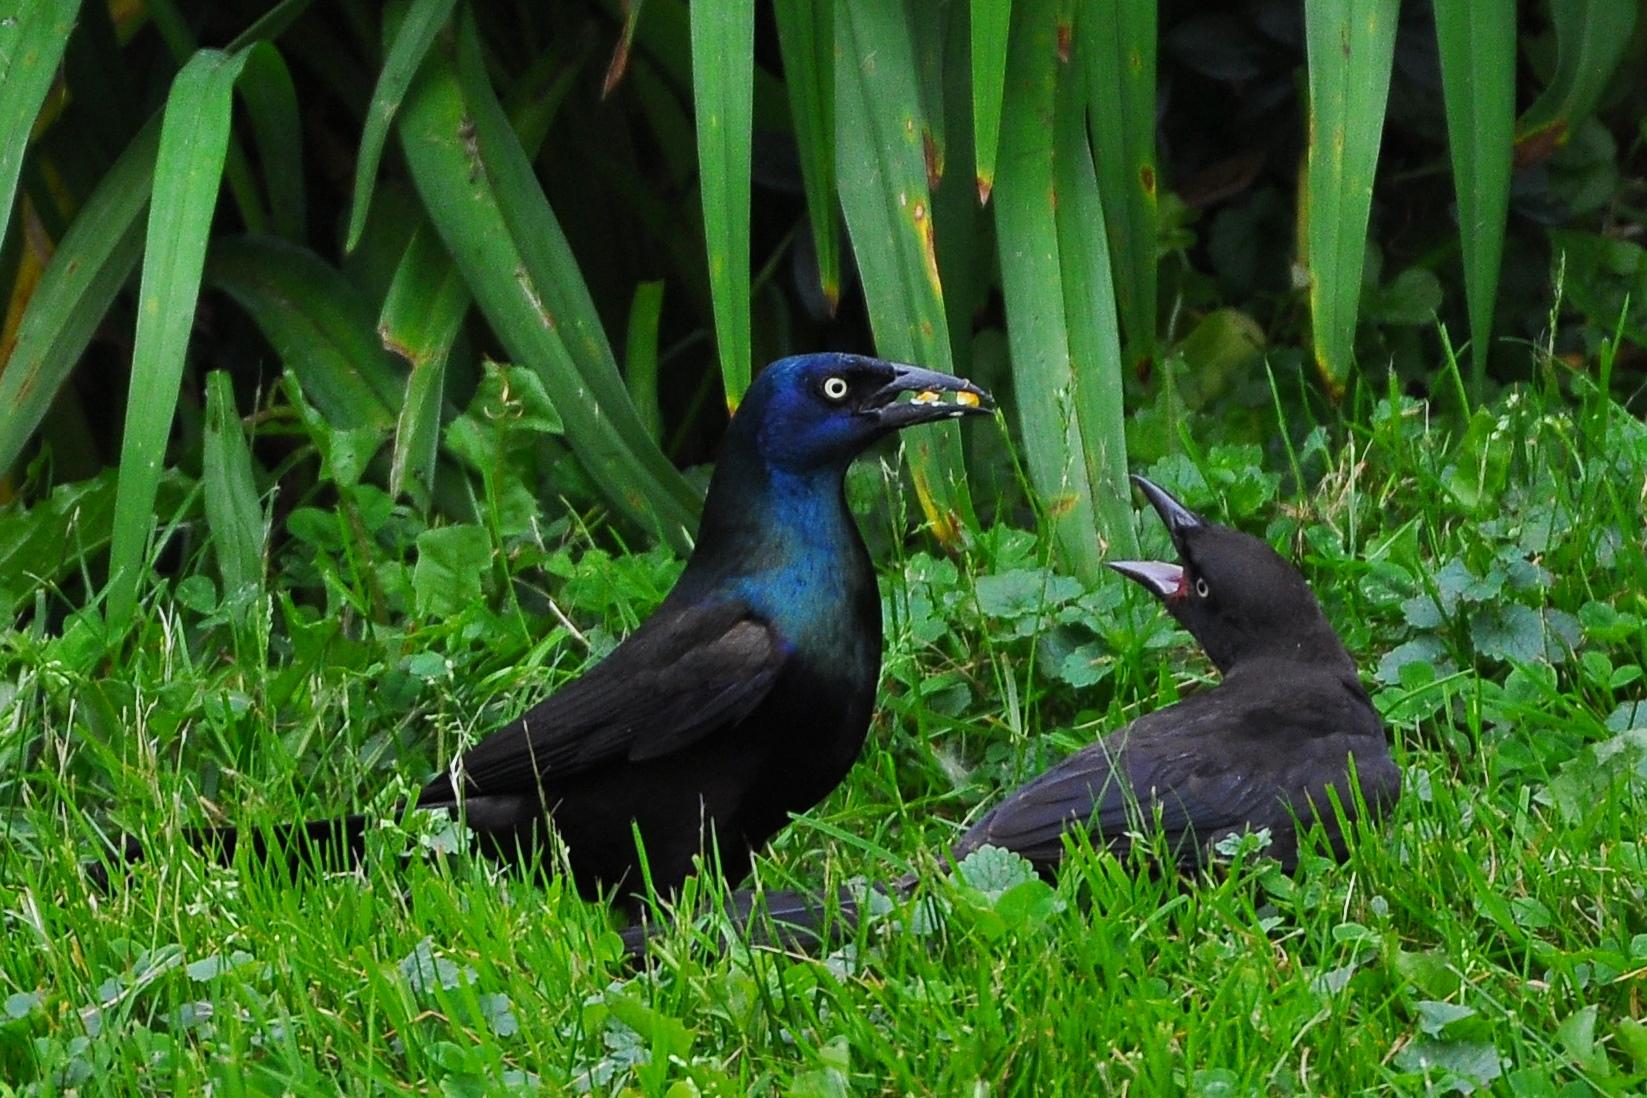 fledgling grackle - photo #49